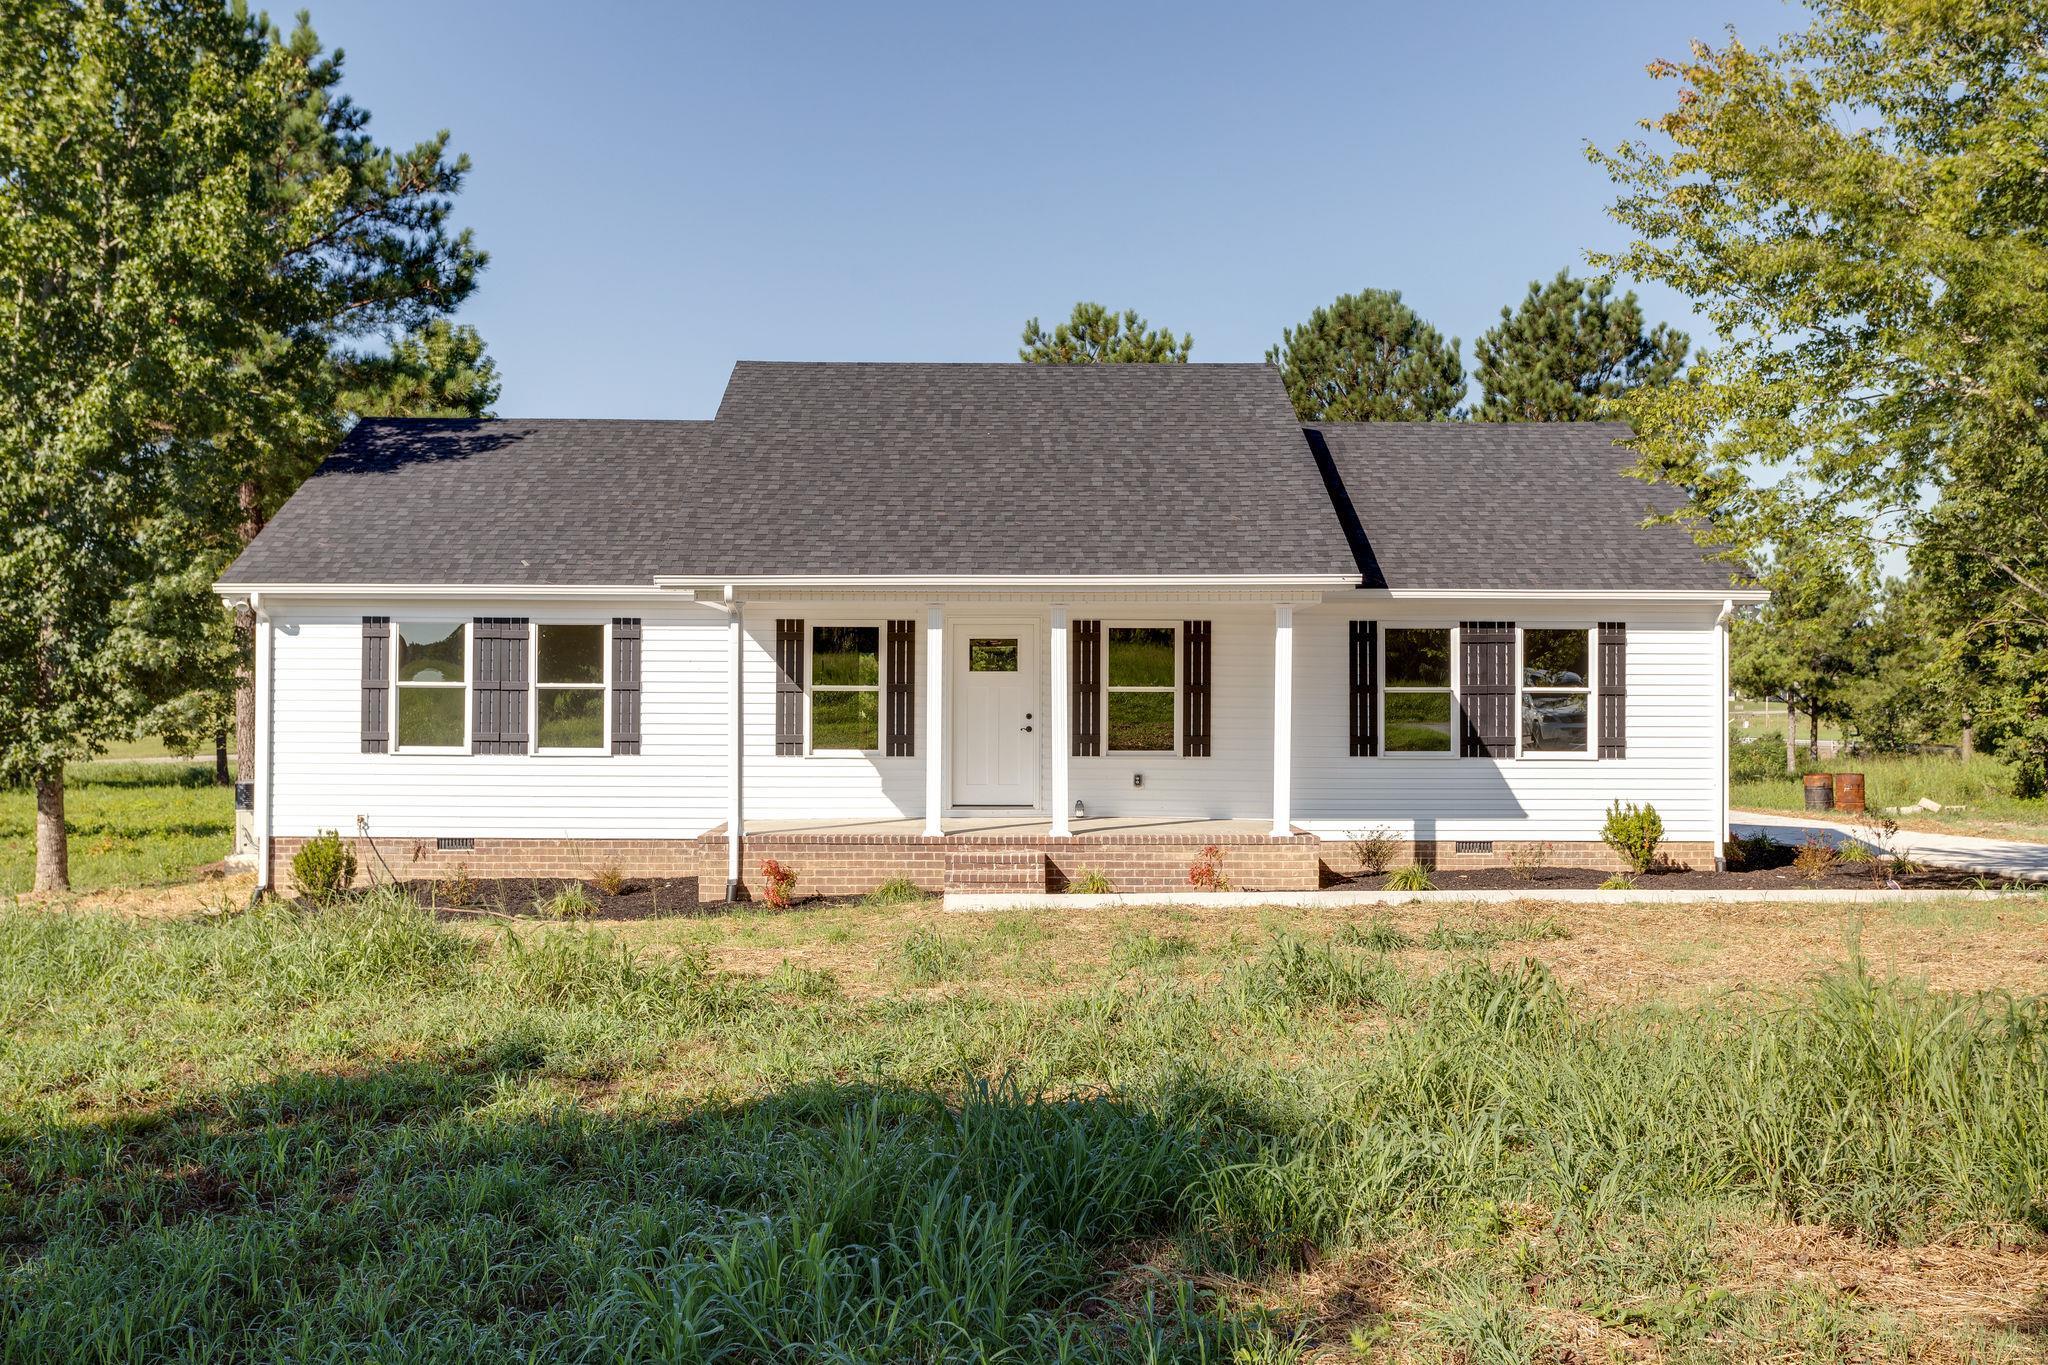 93 Alexander Springs Rd, Summertown, TN 38483 - Summertown, TN real estate listing